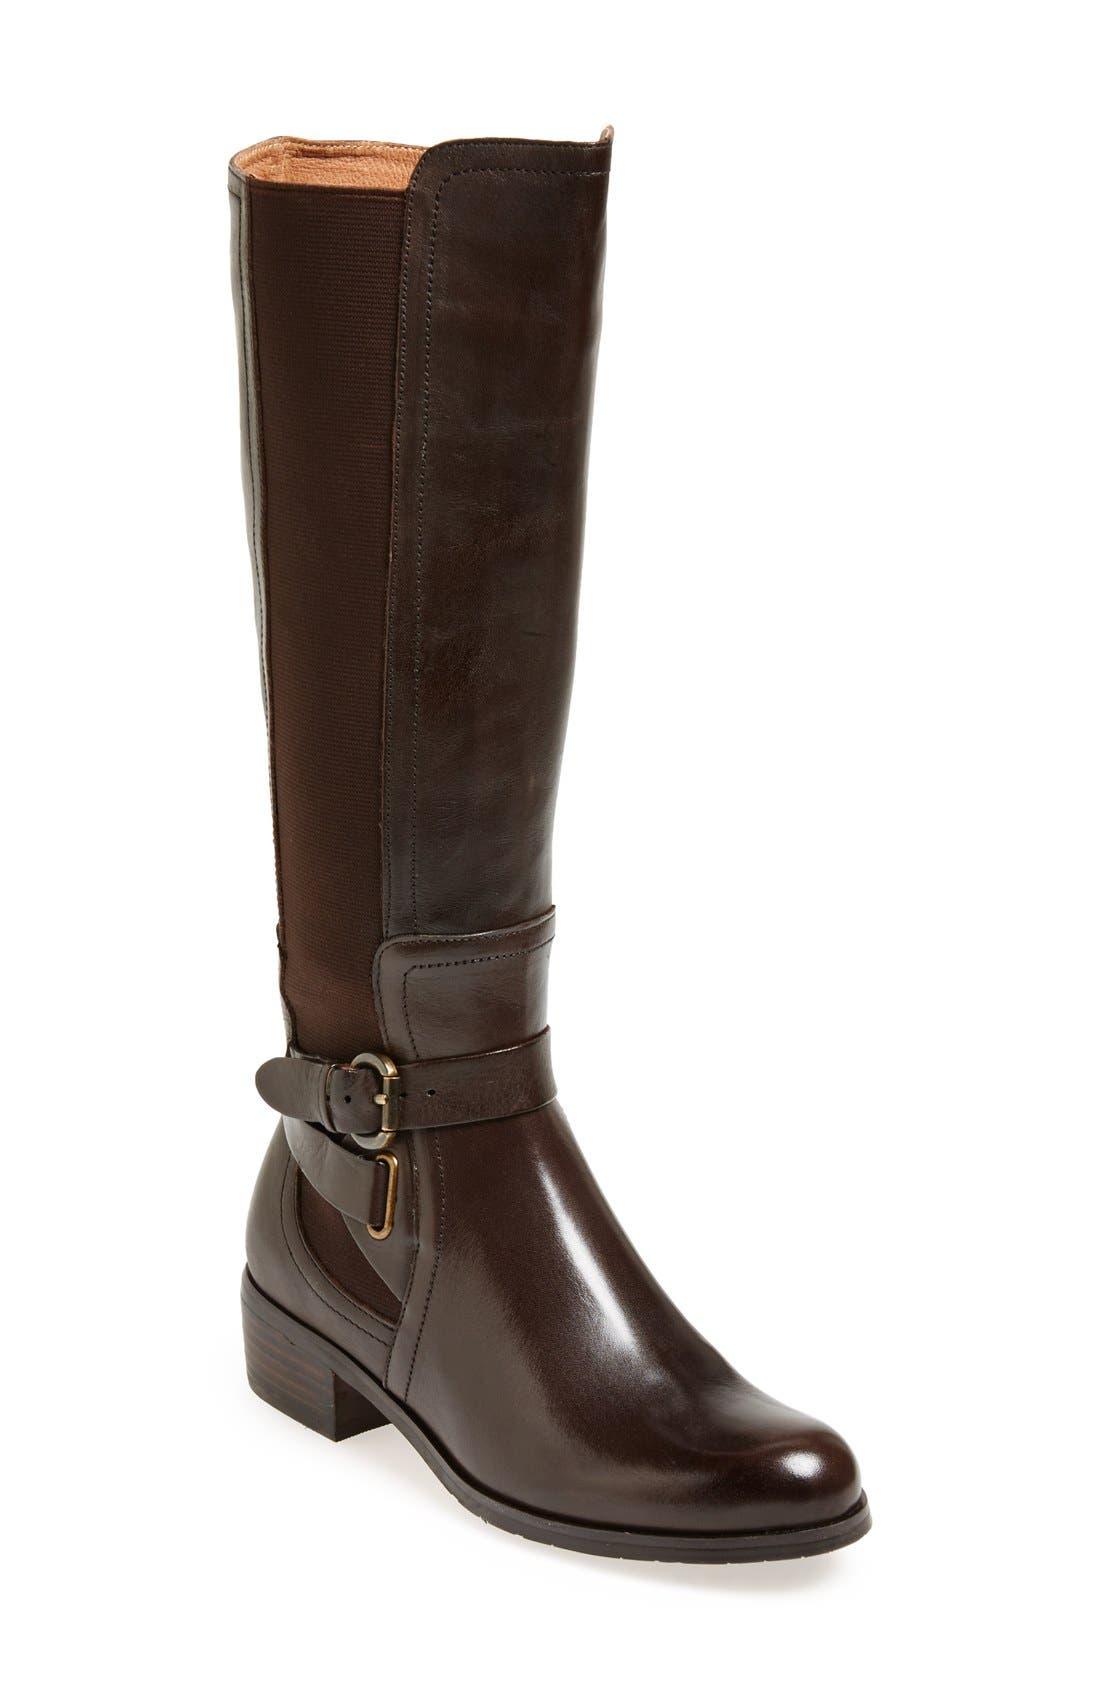 Main Image - Corso Como 'Baylee' Boot (Women)